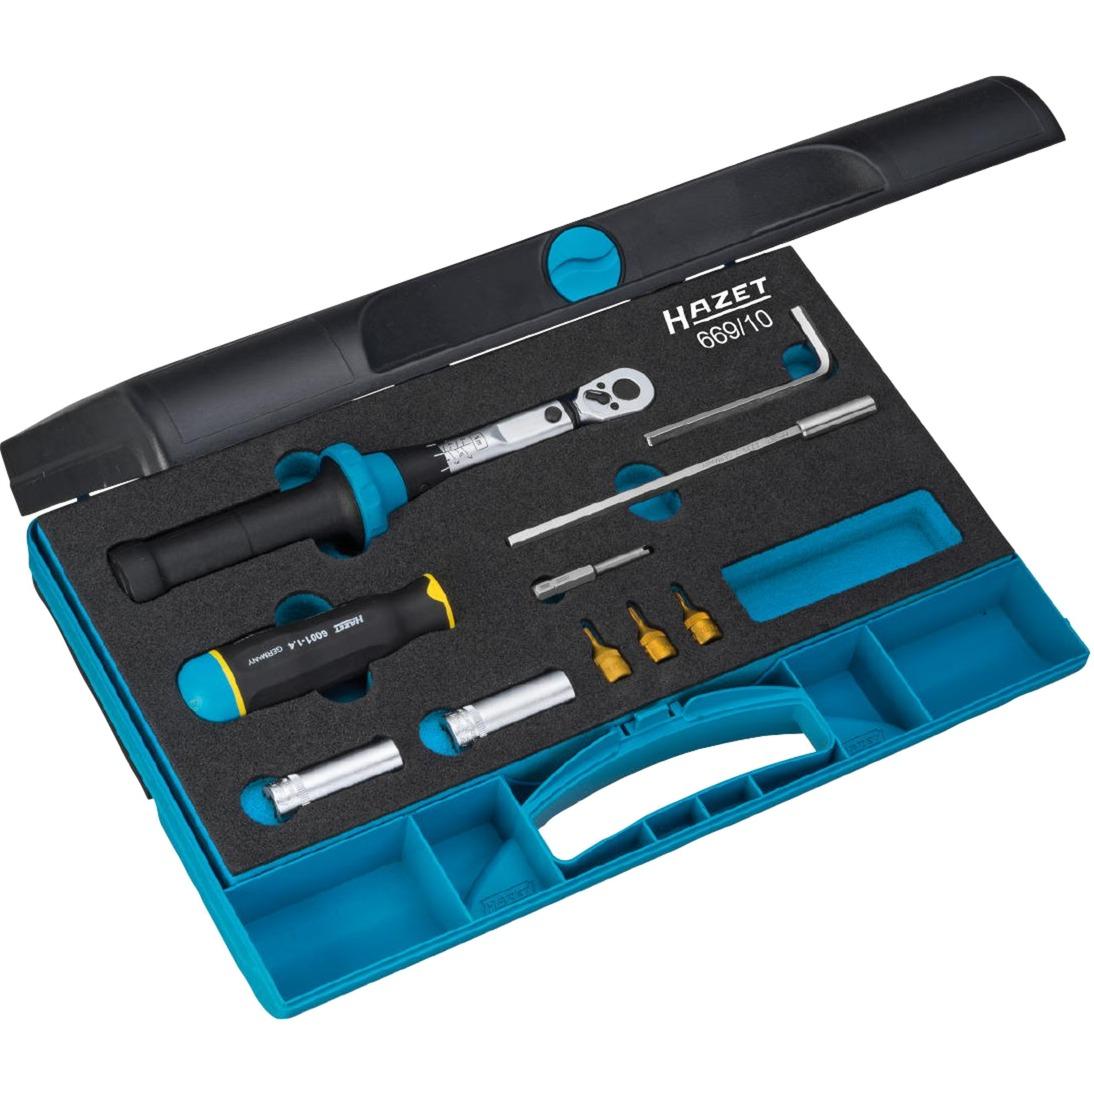 669/10, Kit de herramientas